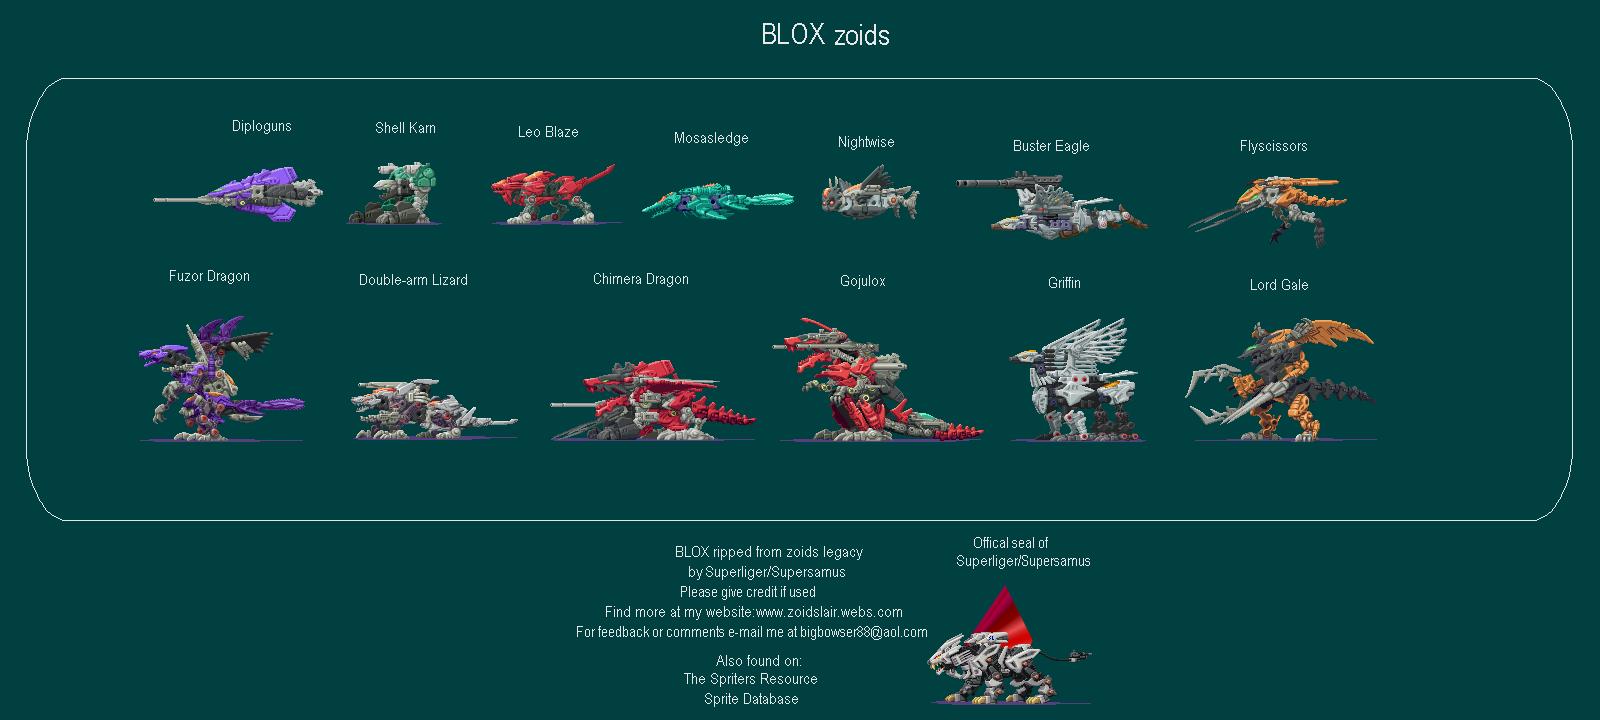 Game Boy Advance Zoids Legacy Blox Fuzors The Spriters Resource